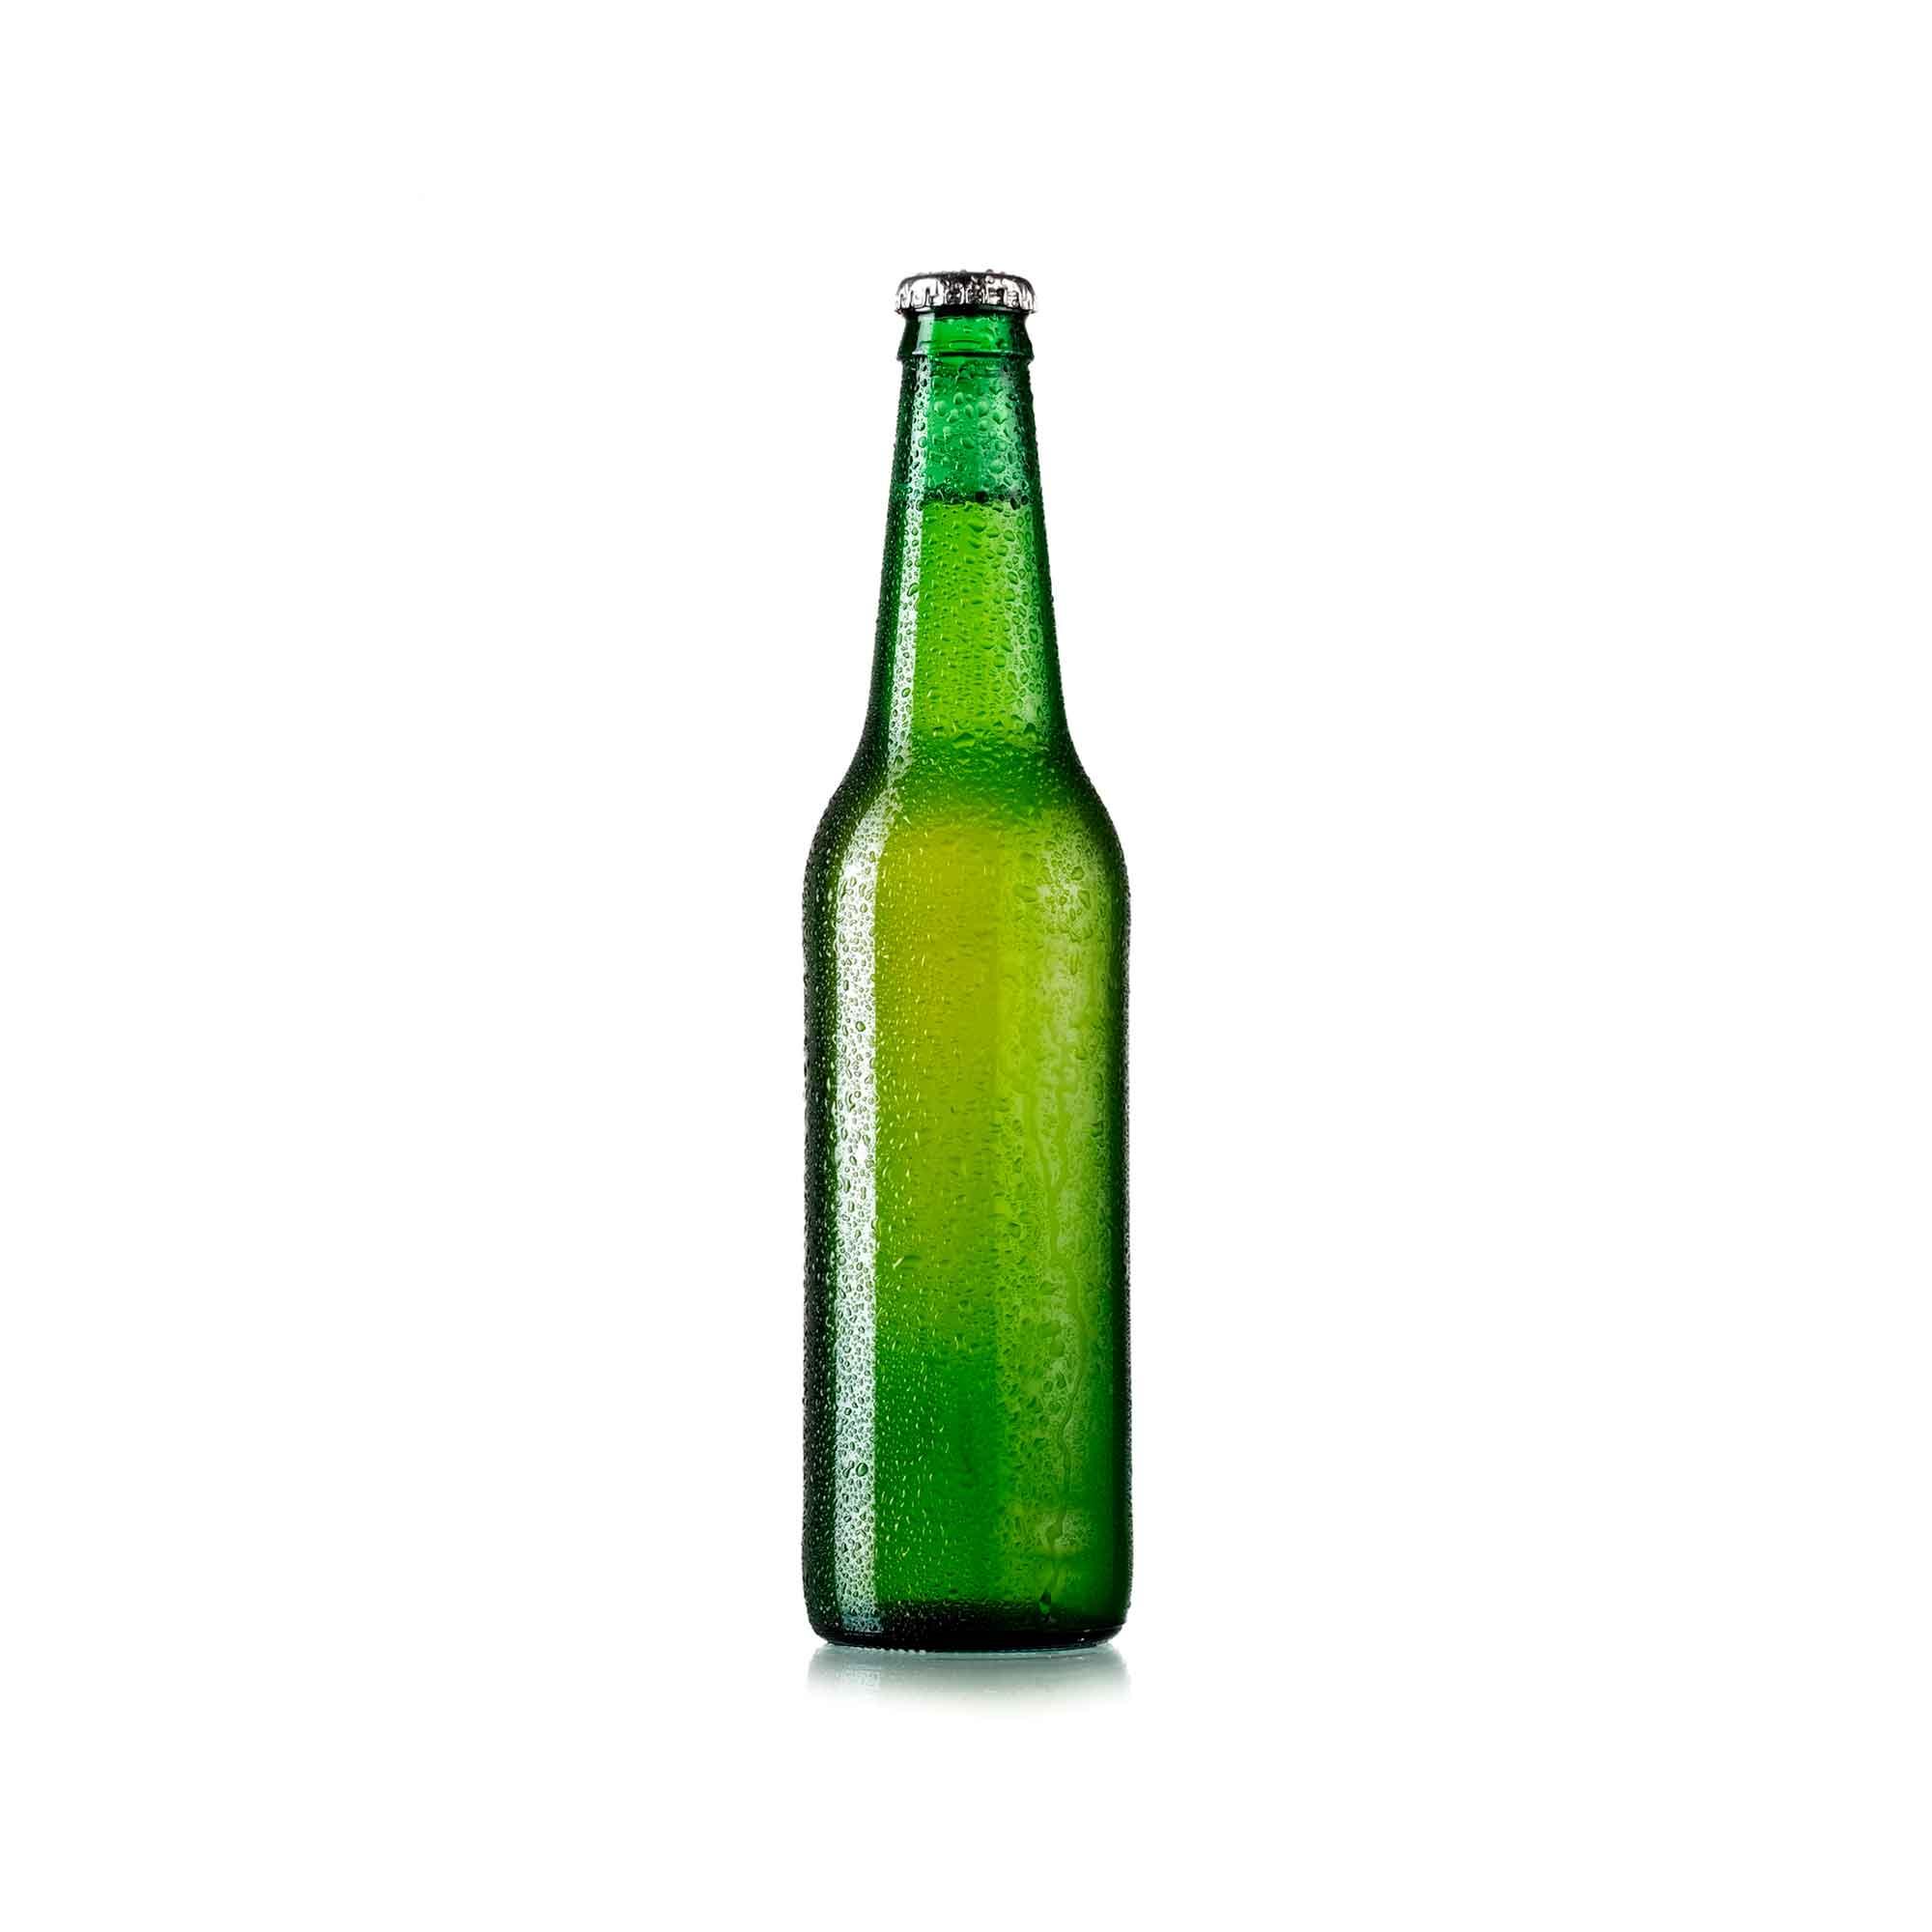 ABK Pils 12oz 4 bottles